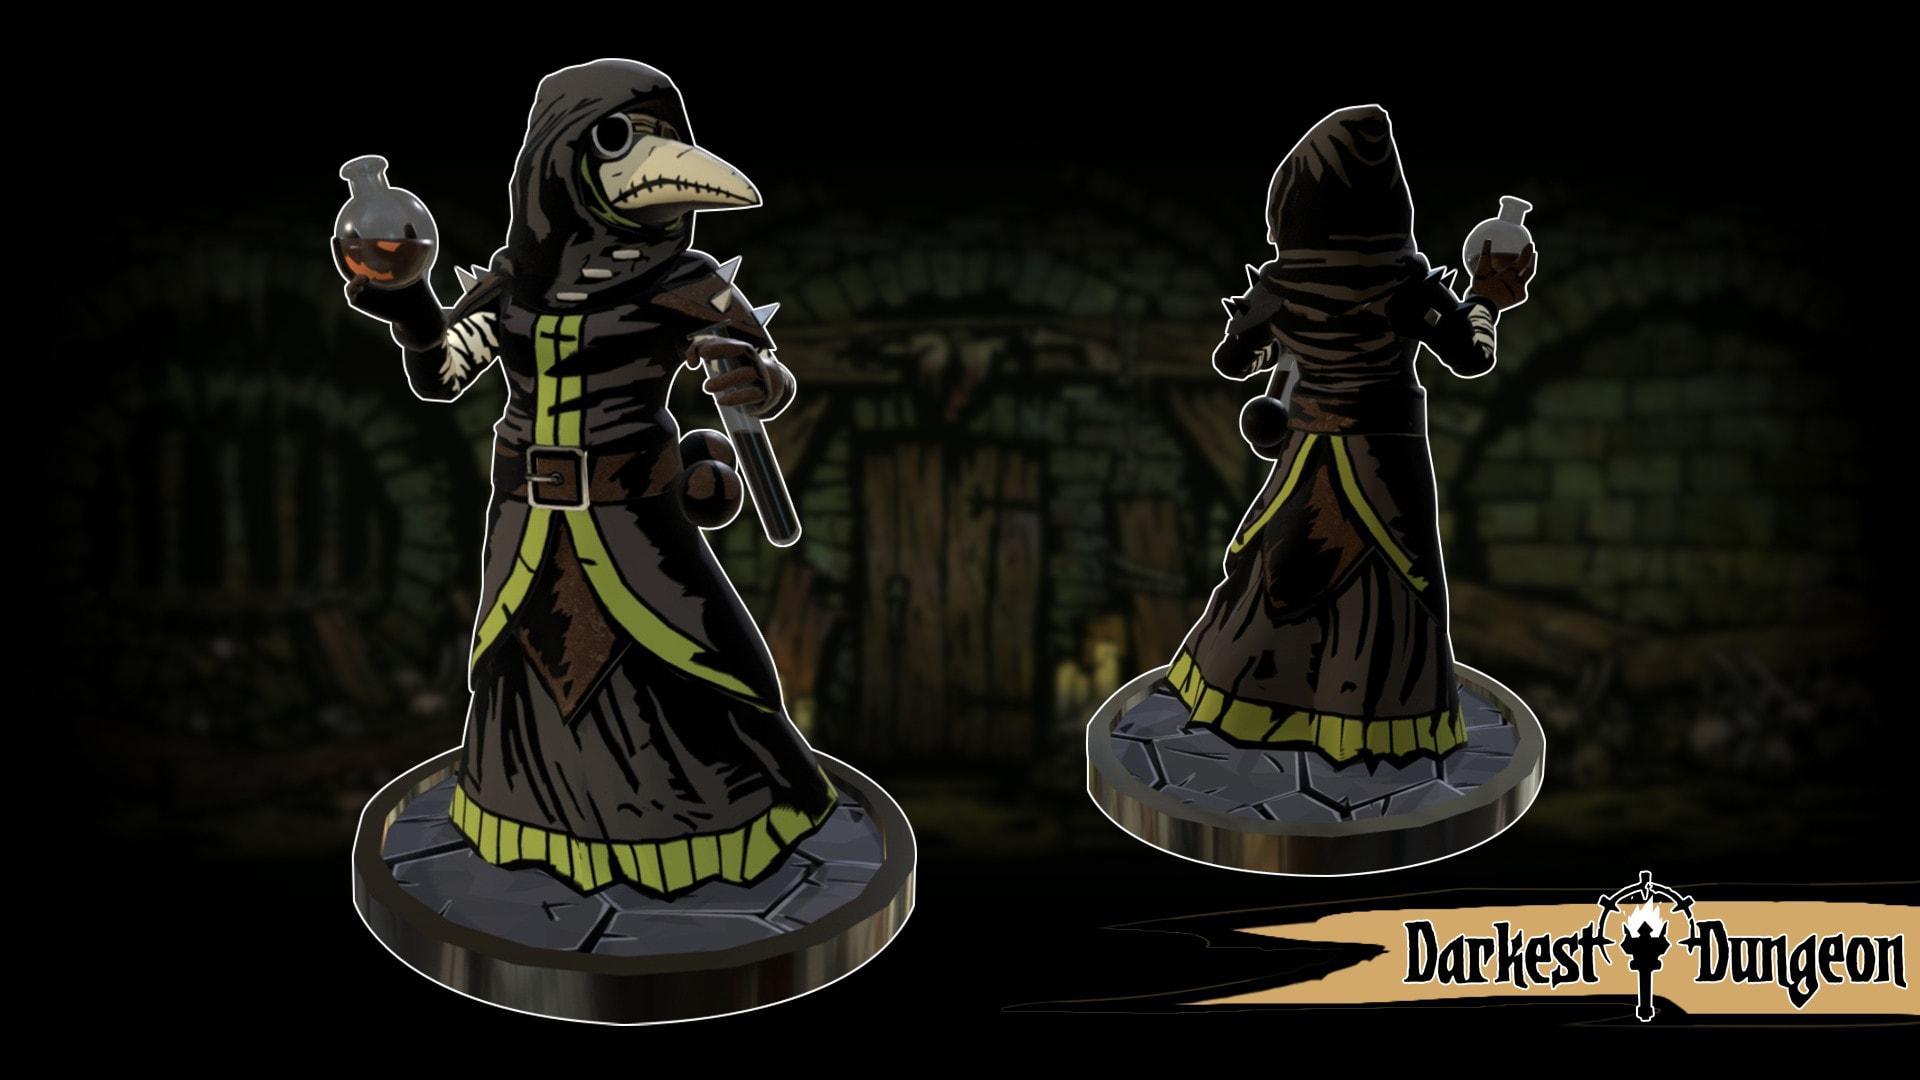 Darkest Dungeon Plague Doctor HD Desktop Wallpapers 1920x1080